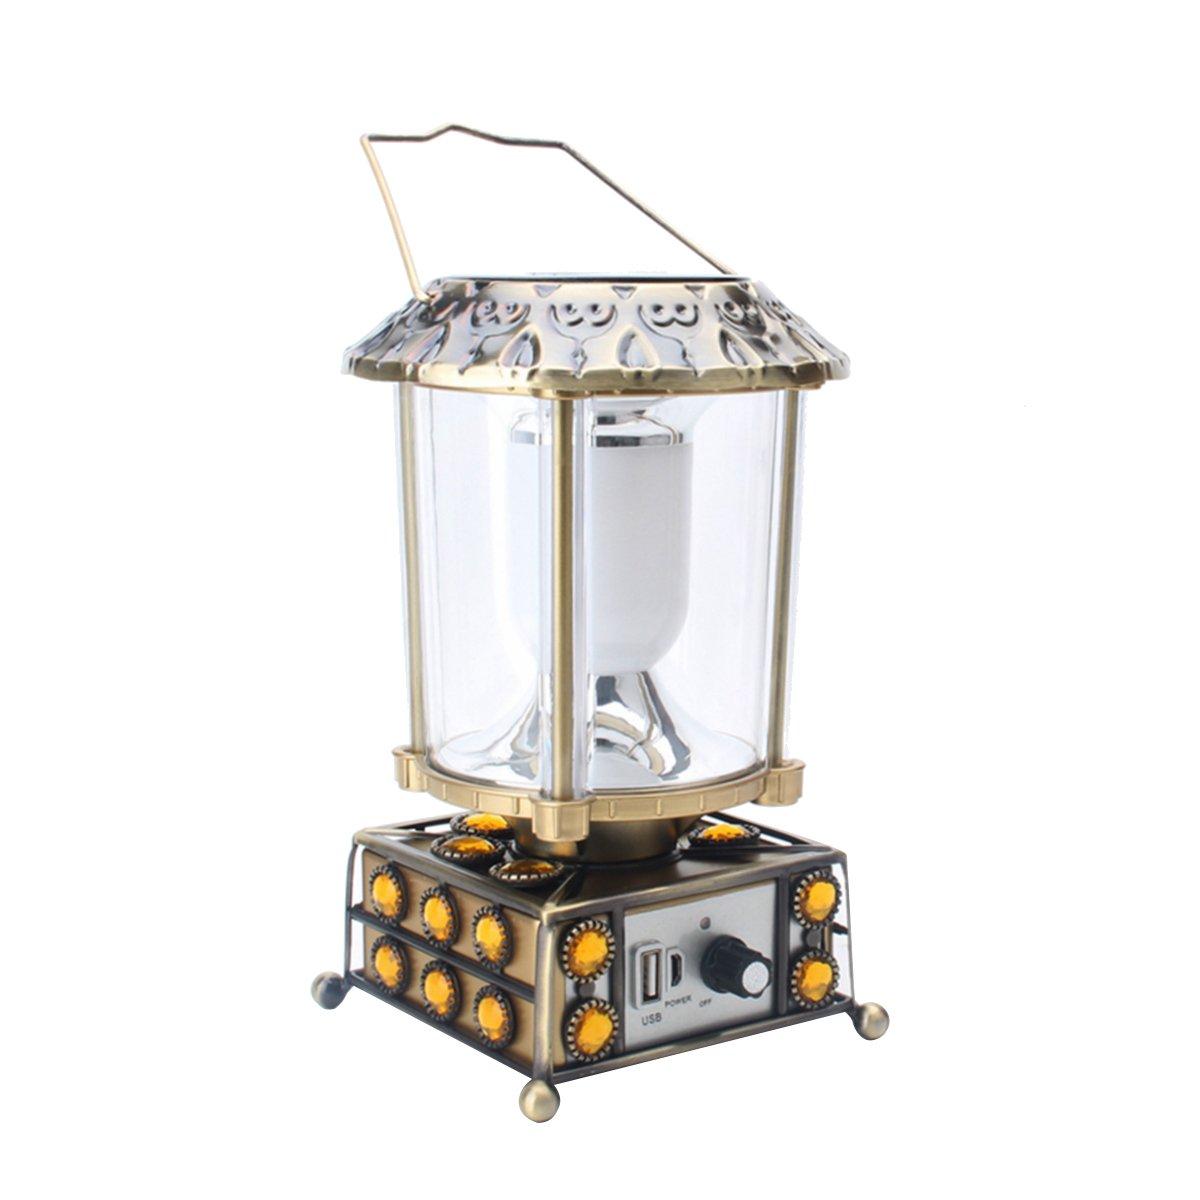 OLSUS Solar Charging 240lm 10-5630 LED White USB Aluminum Alloy LED Camping Lamp - Green Bronze